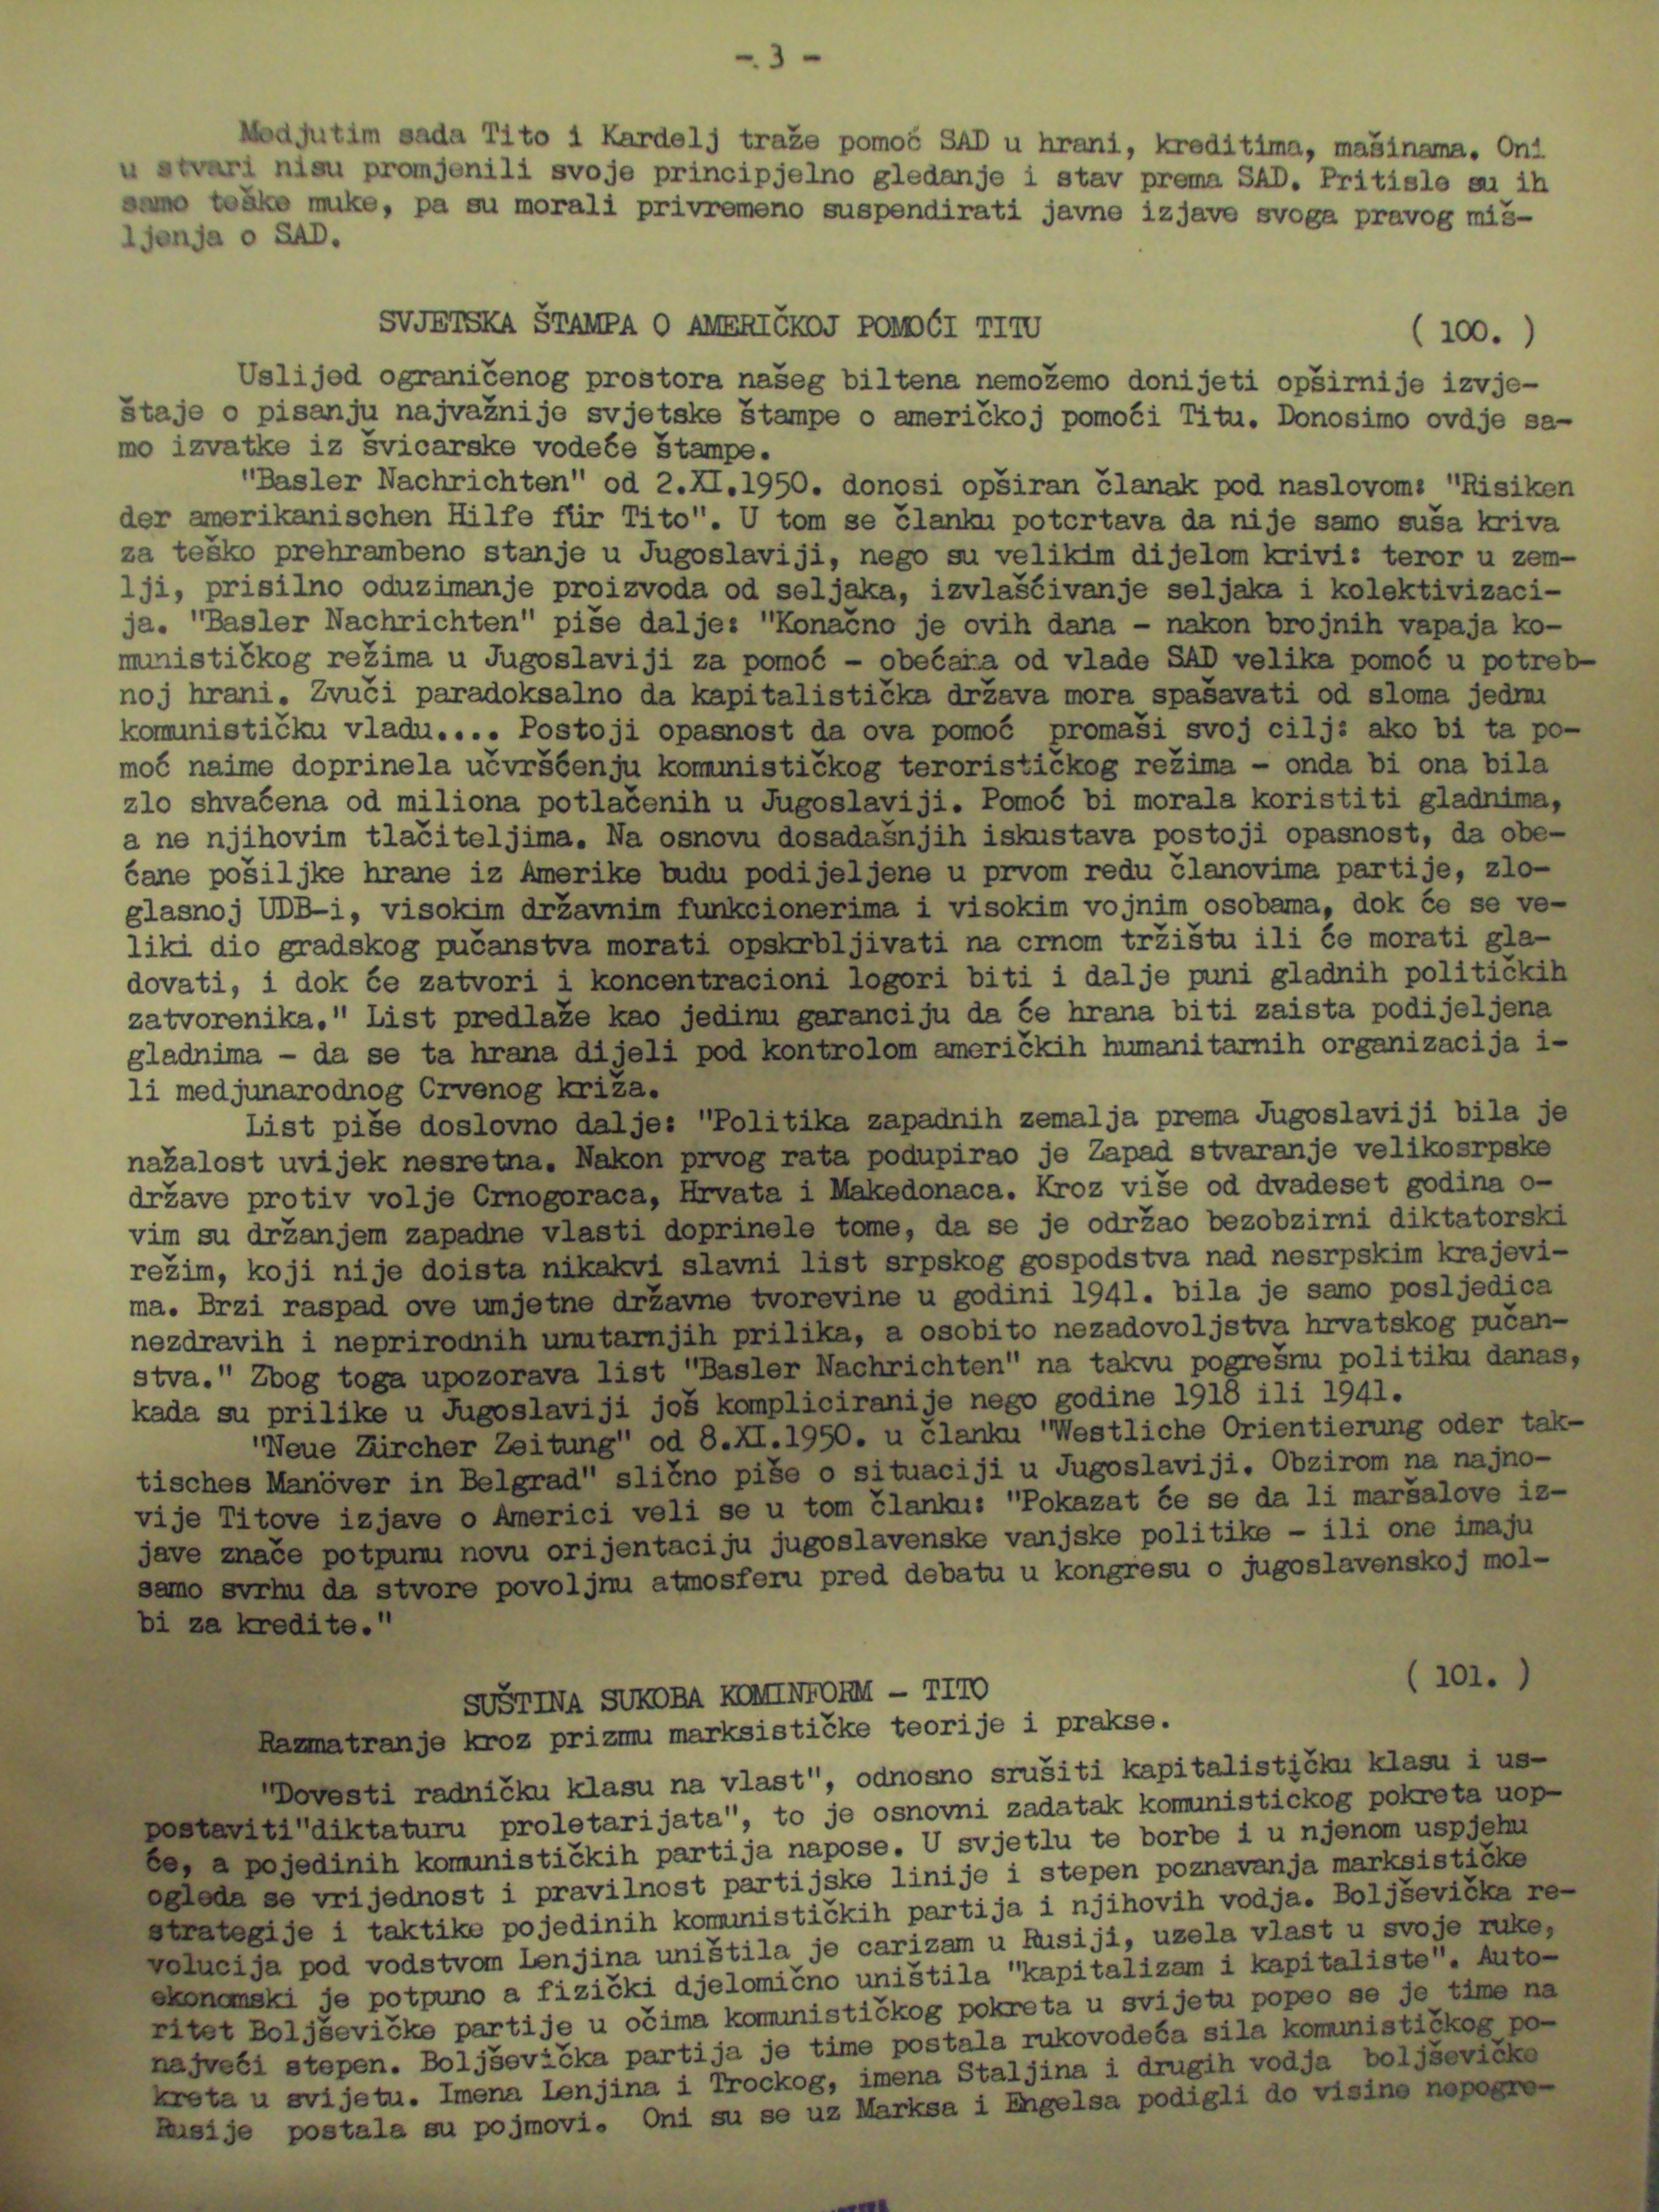 "Juretić, Augustin. ""Suština sukoba Kominform – Tito"" [The essence of the Cominform conflict – Tito] (Hrvatski dom), 1950. Article"